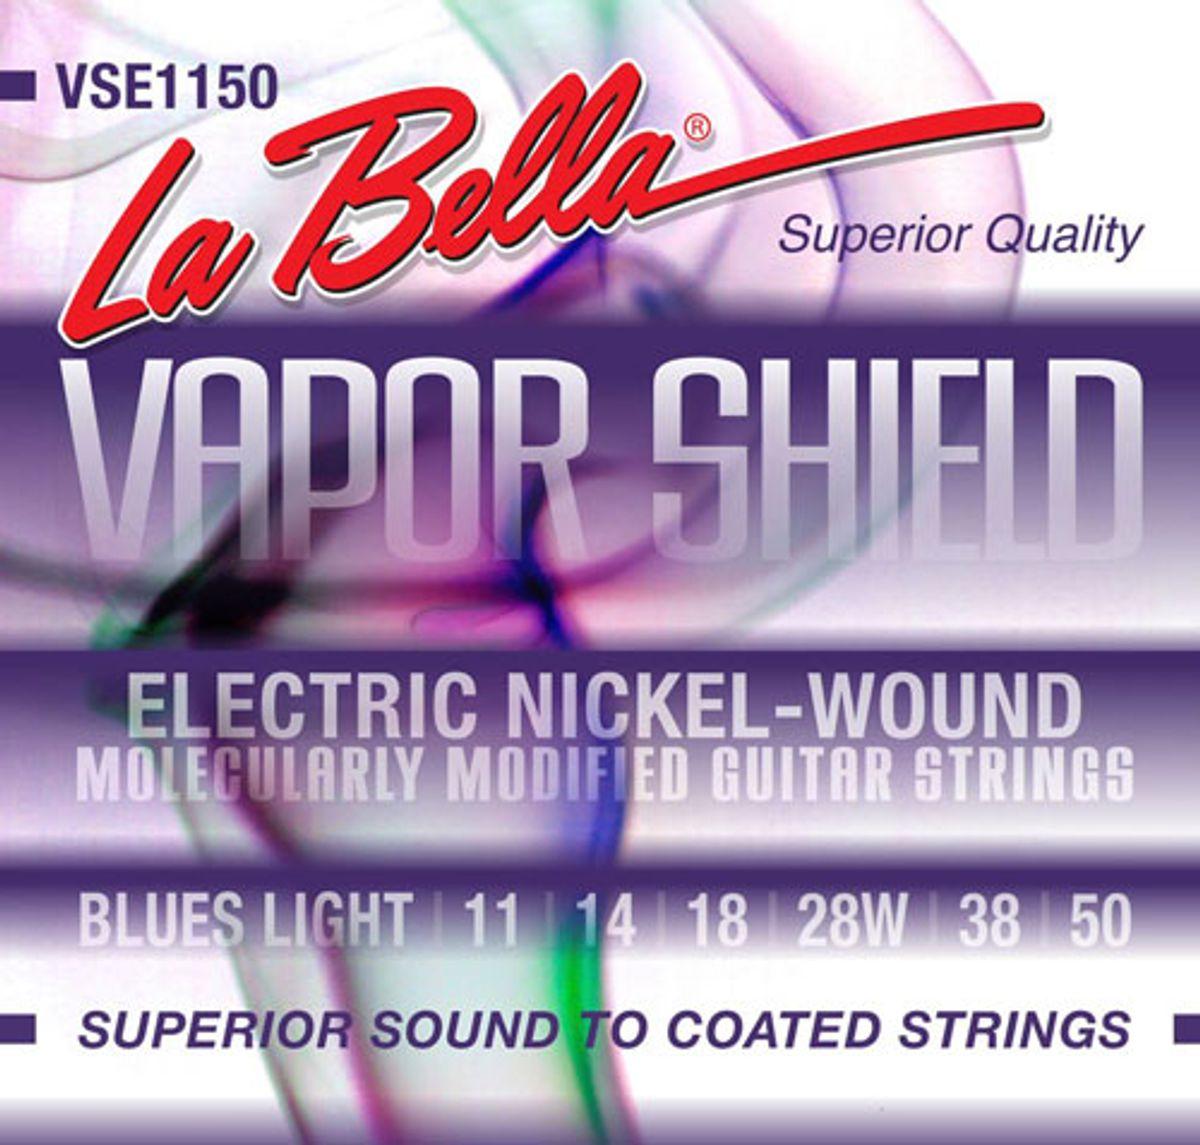 La Bella Strings Introduces Vapor Shield Treated Strings